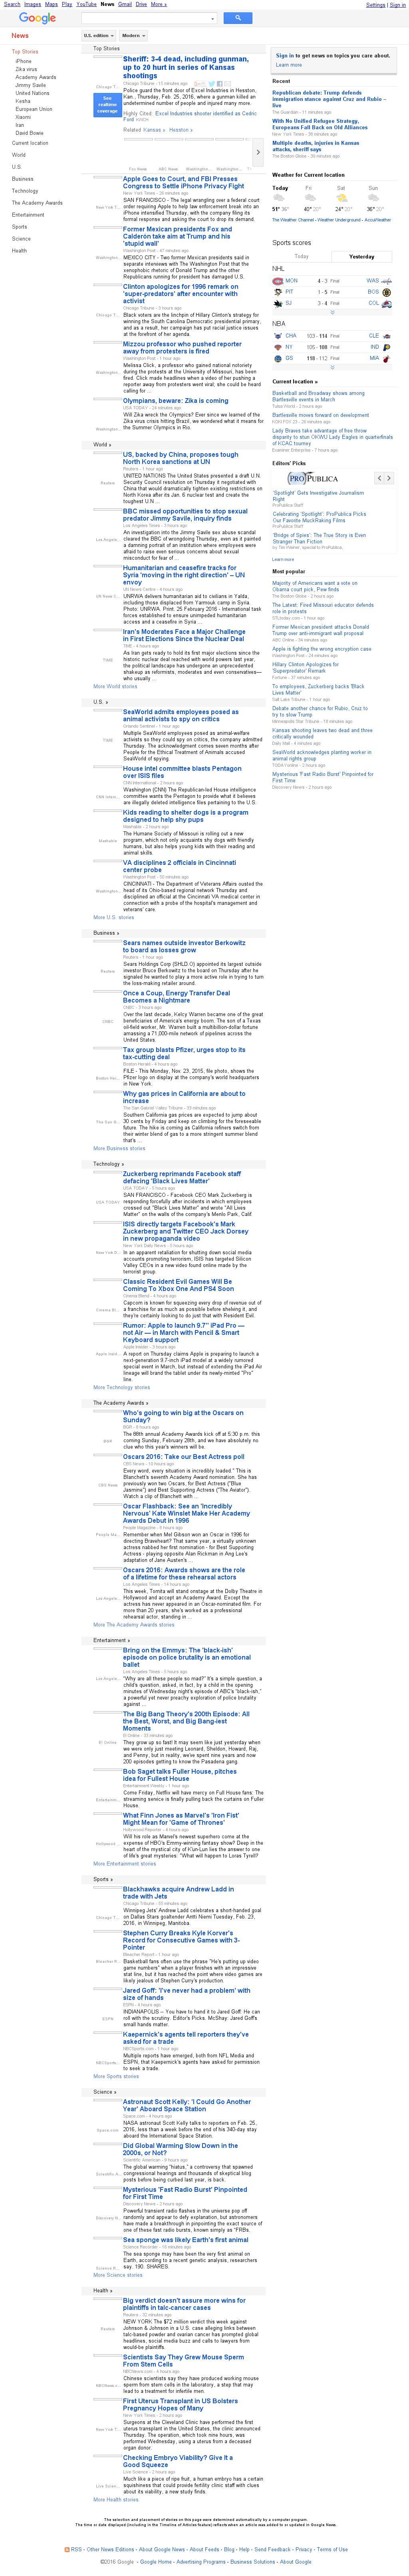 Google News at Friday Feb. 26, 2016, 2:07 a.m. UTC